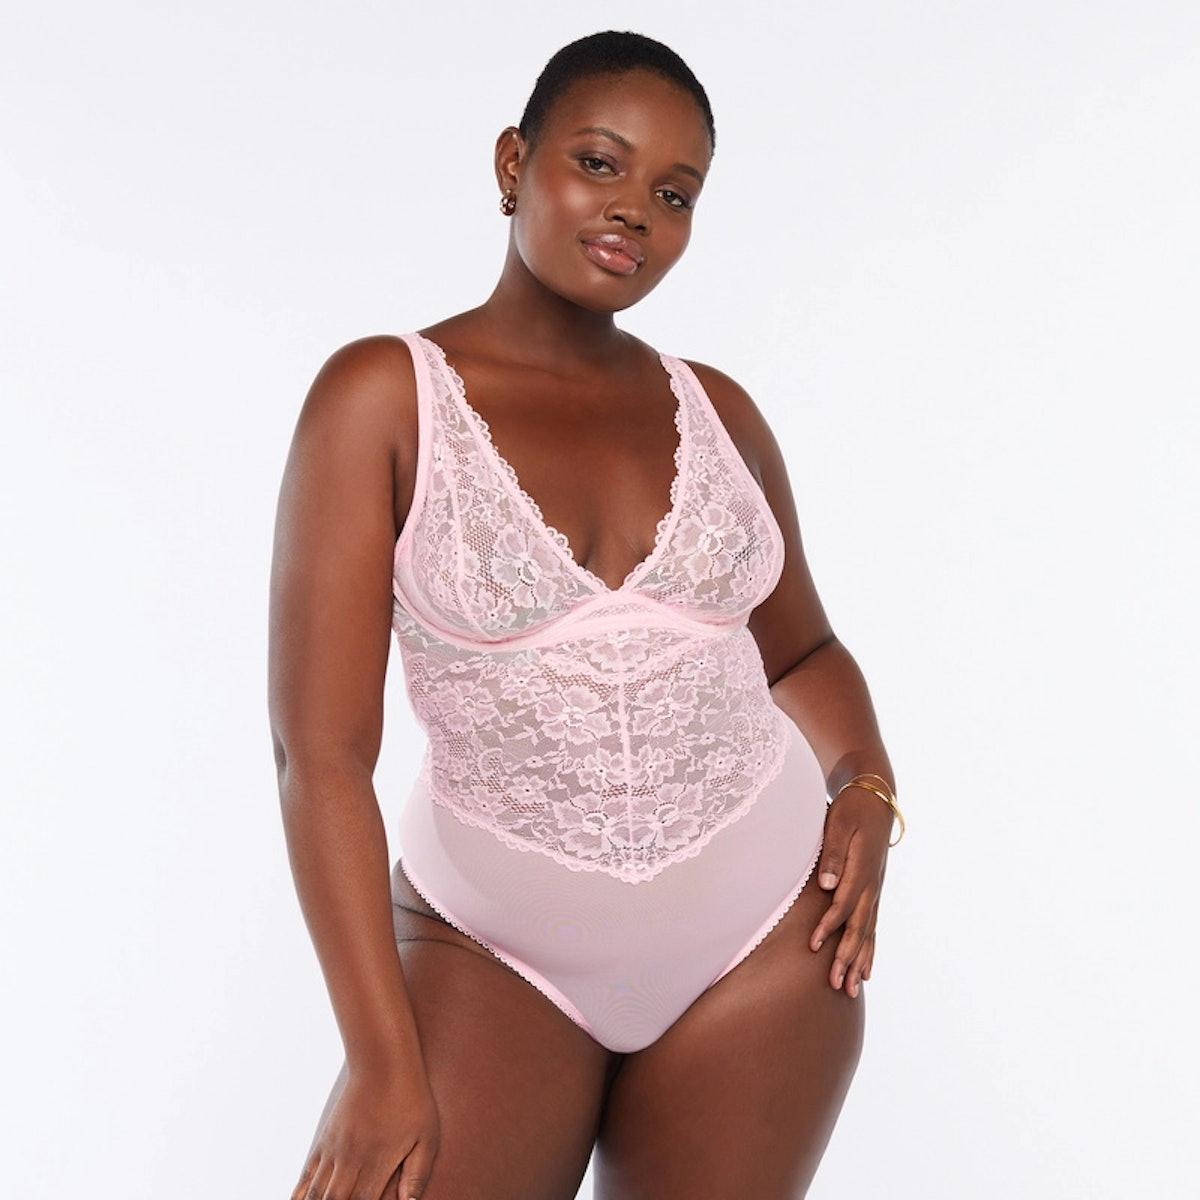 Savage x Fenty pink lace body suit